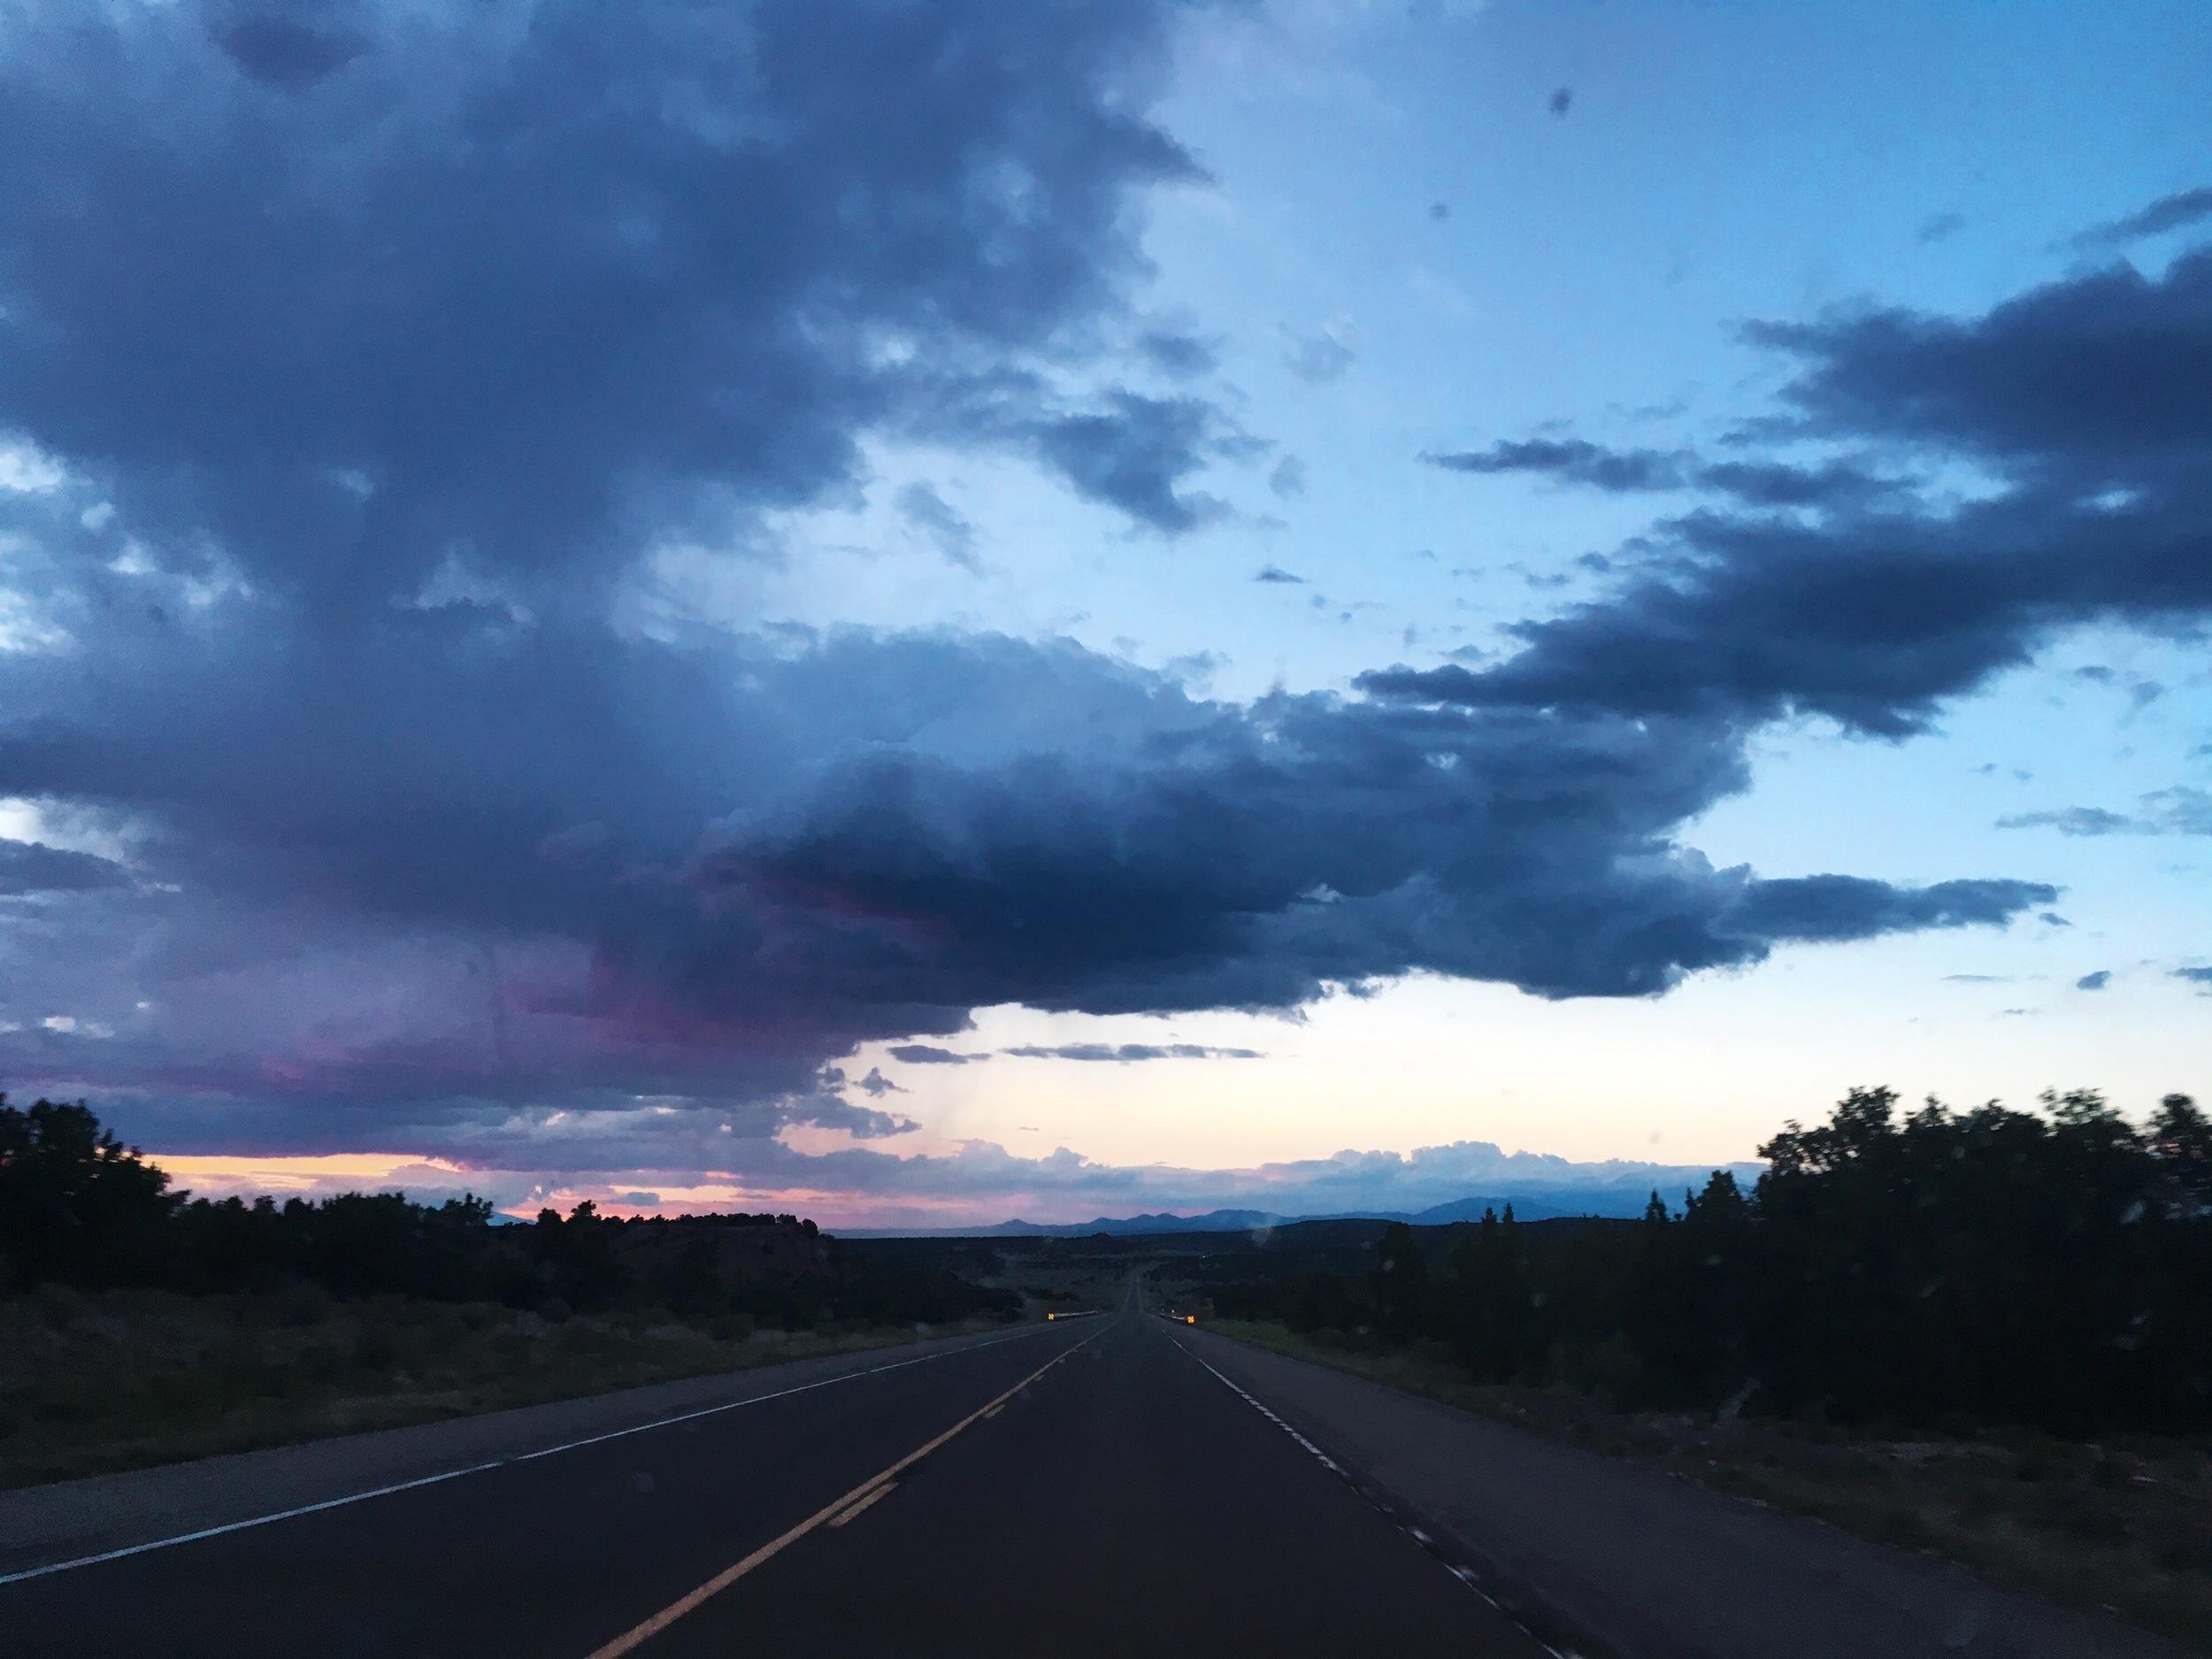 Santa Fe sunset road